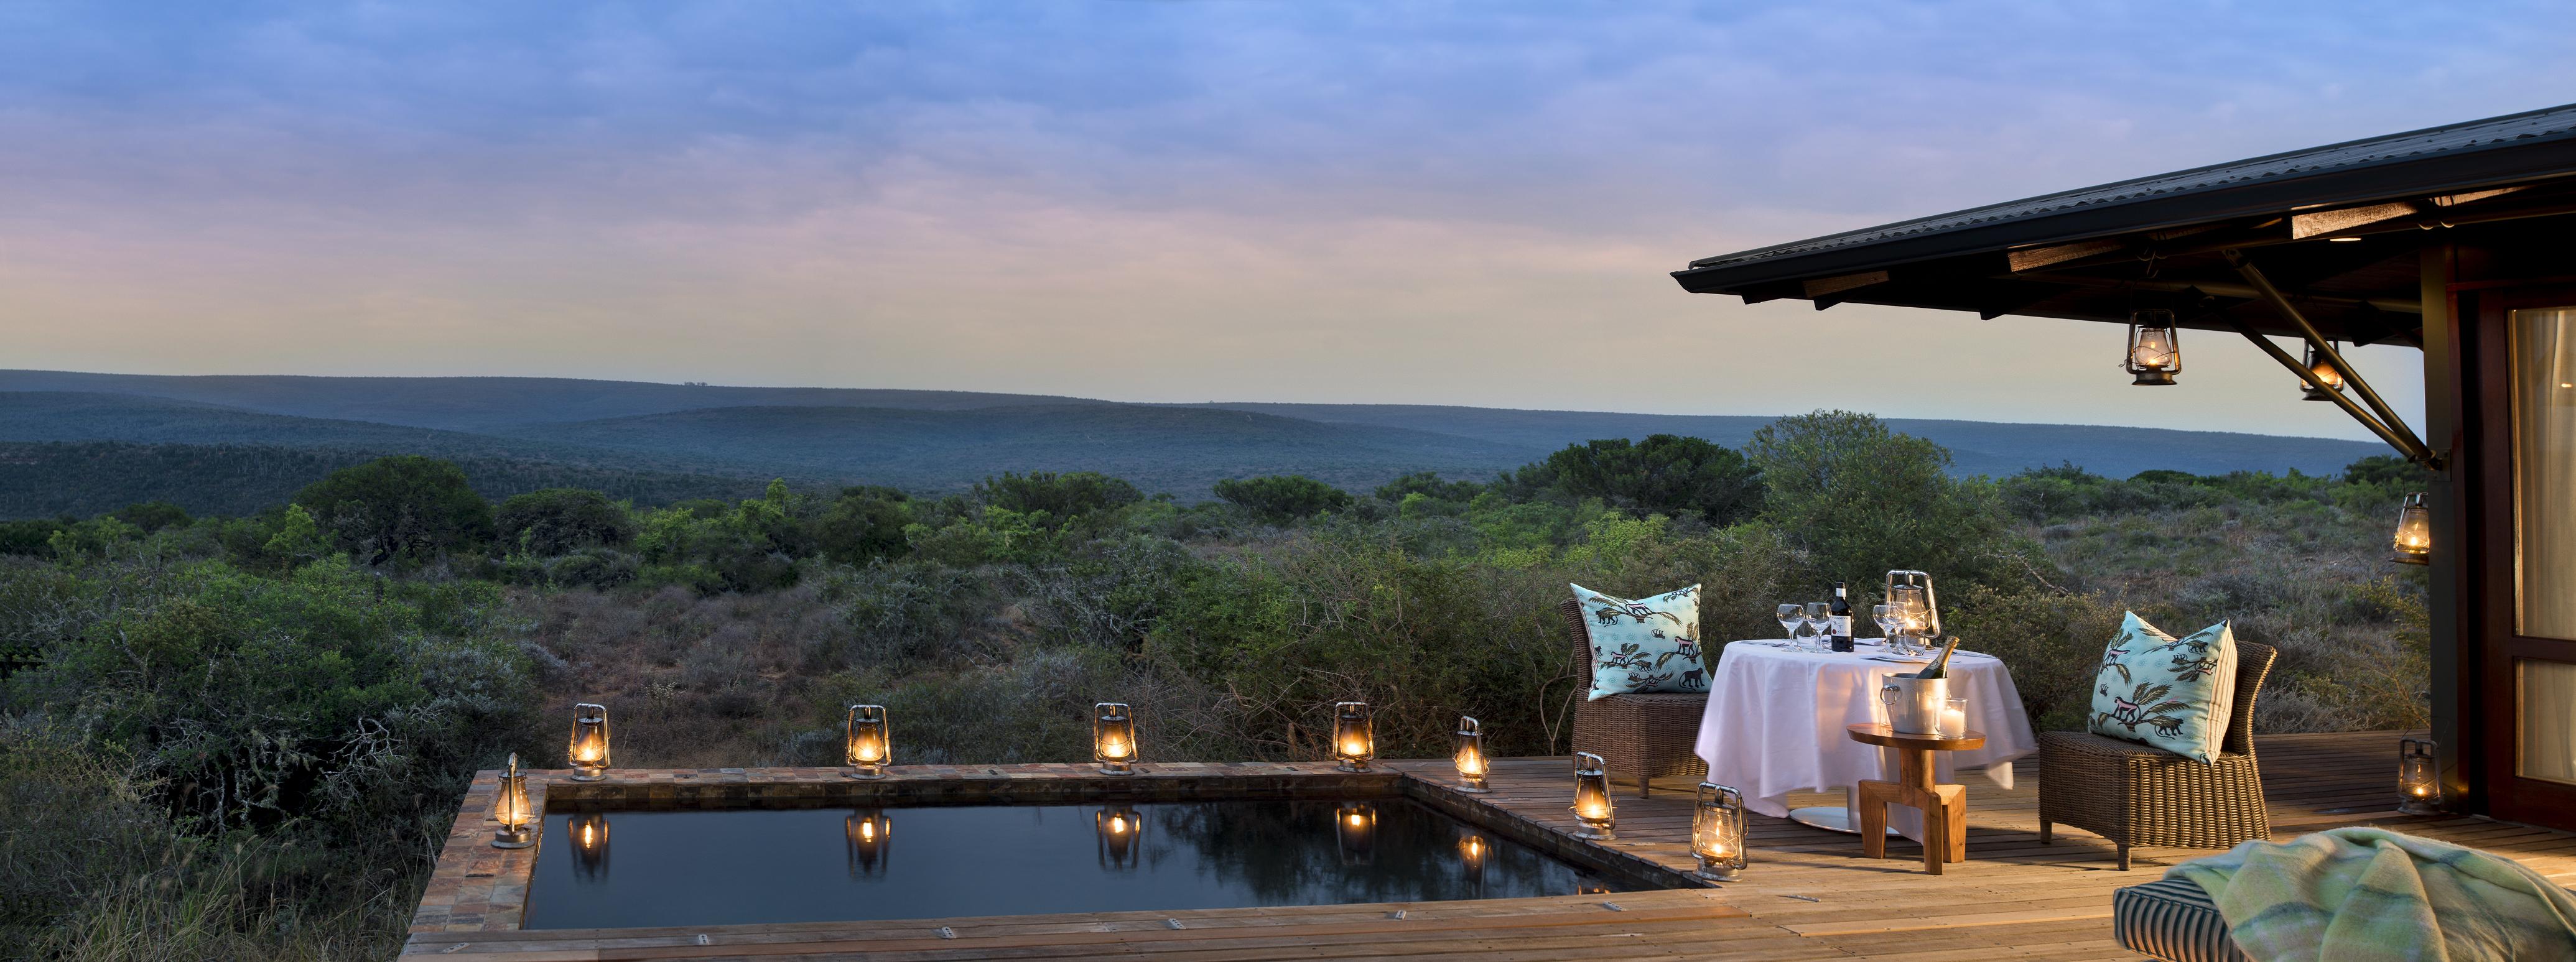 Ecca Lodge South Africa Exterior Dinner